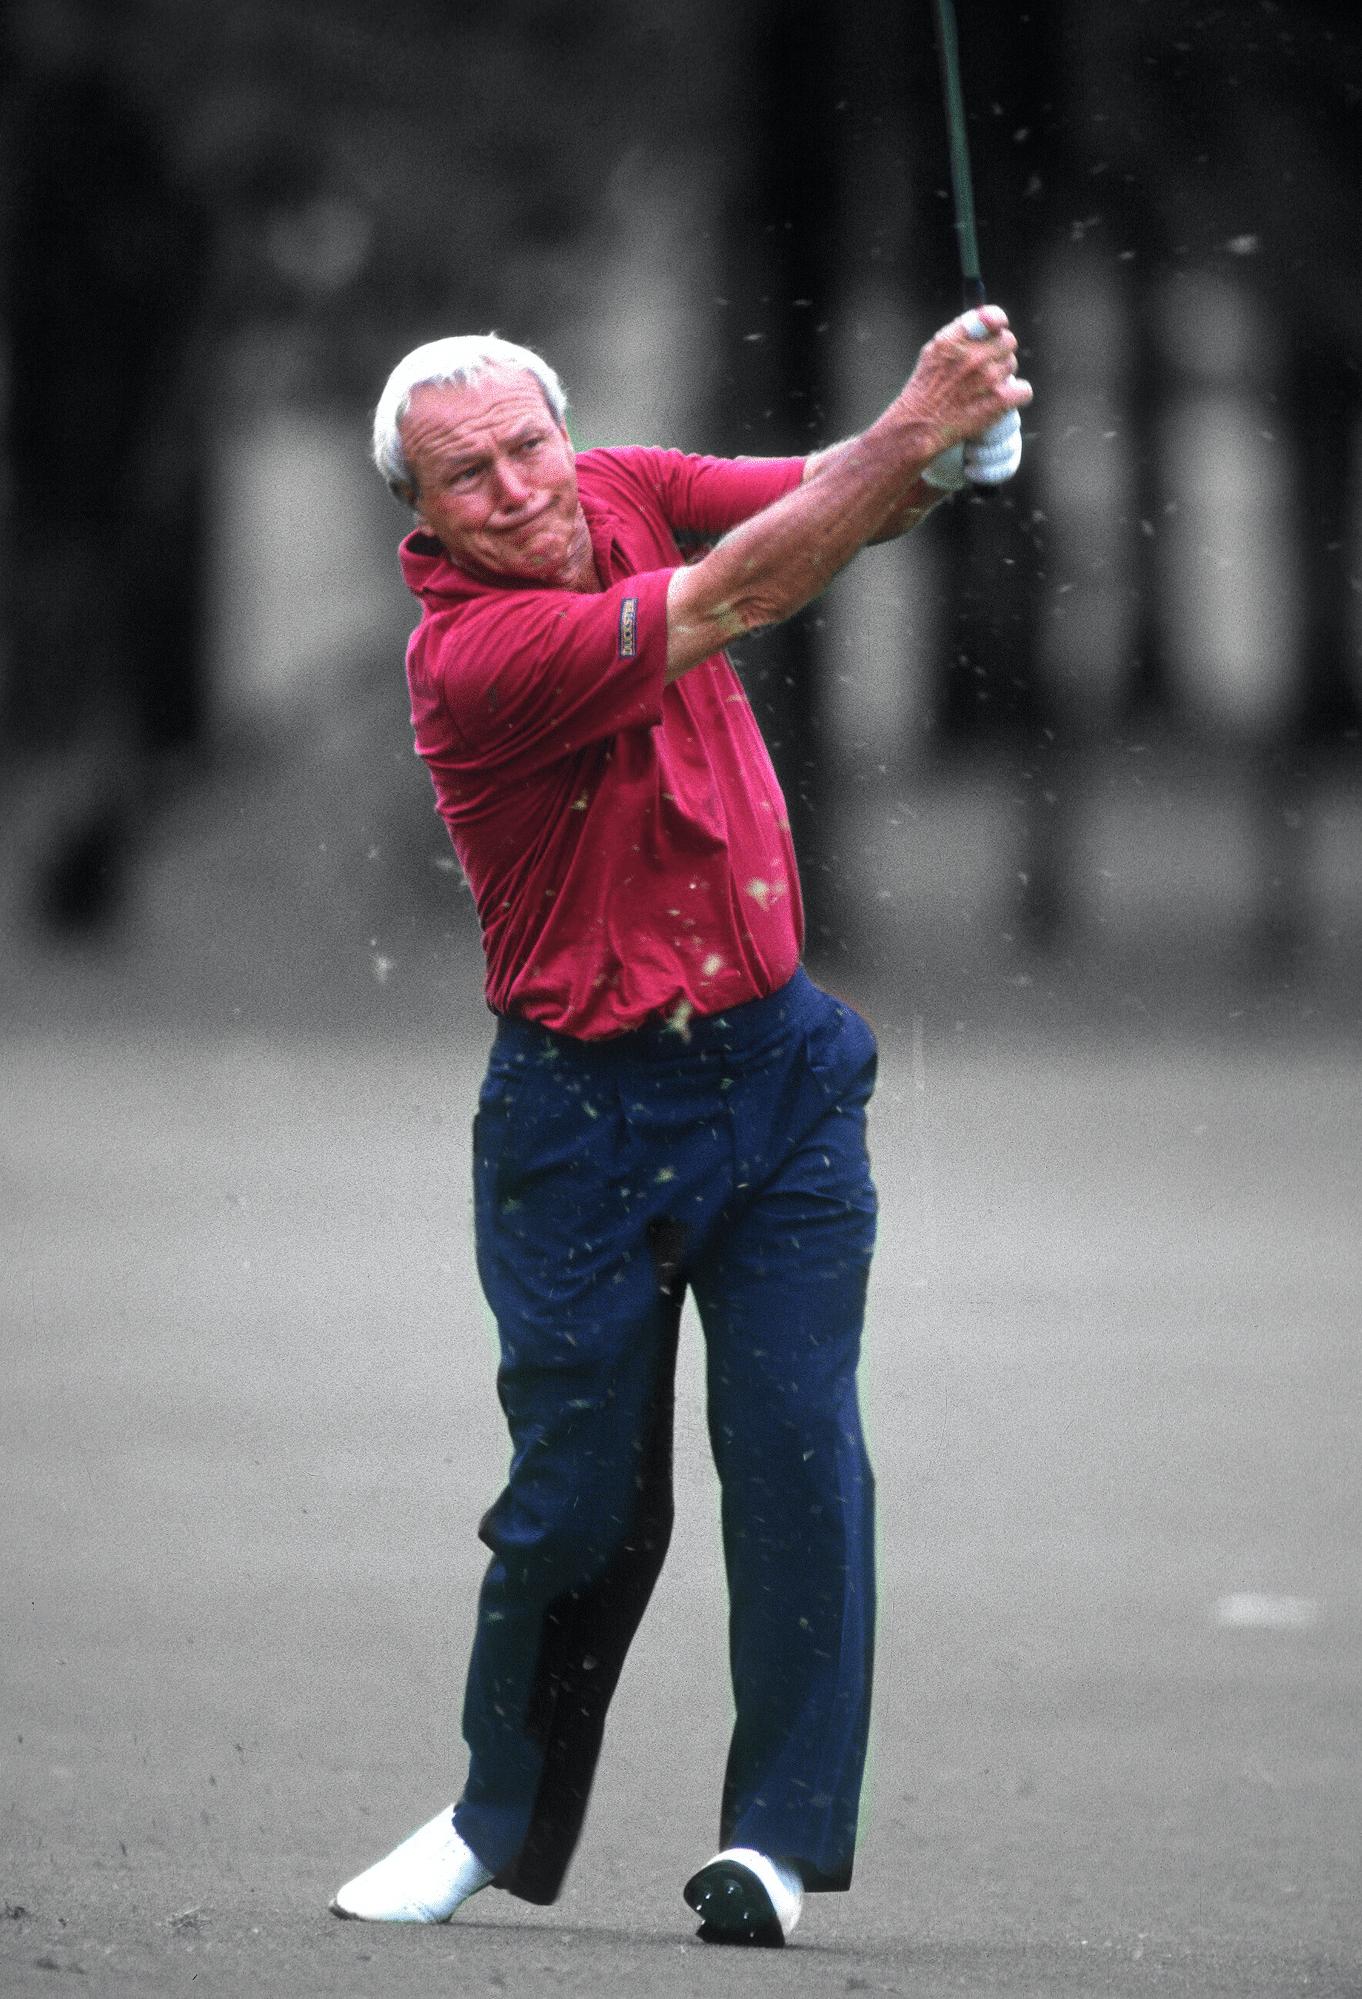 Golf stroke mechanics